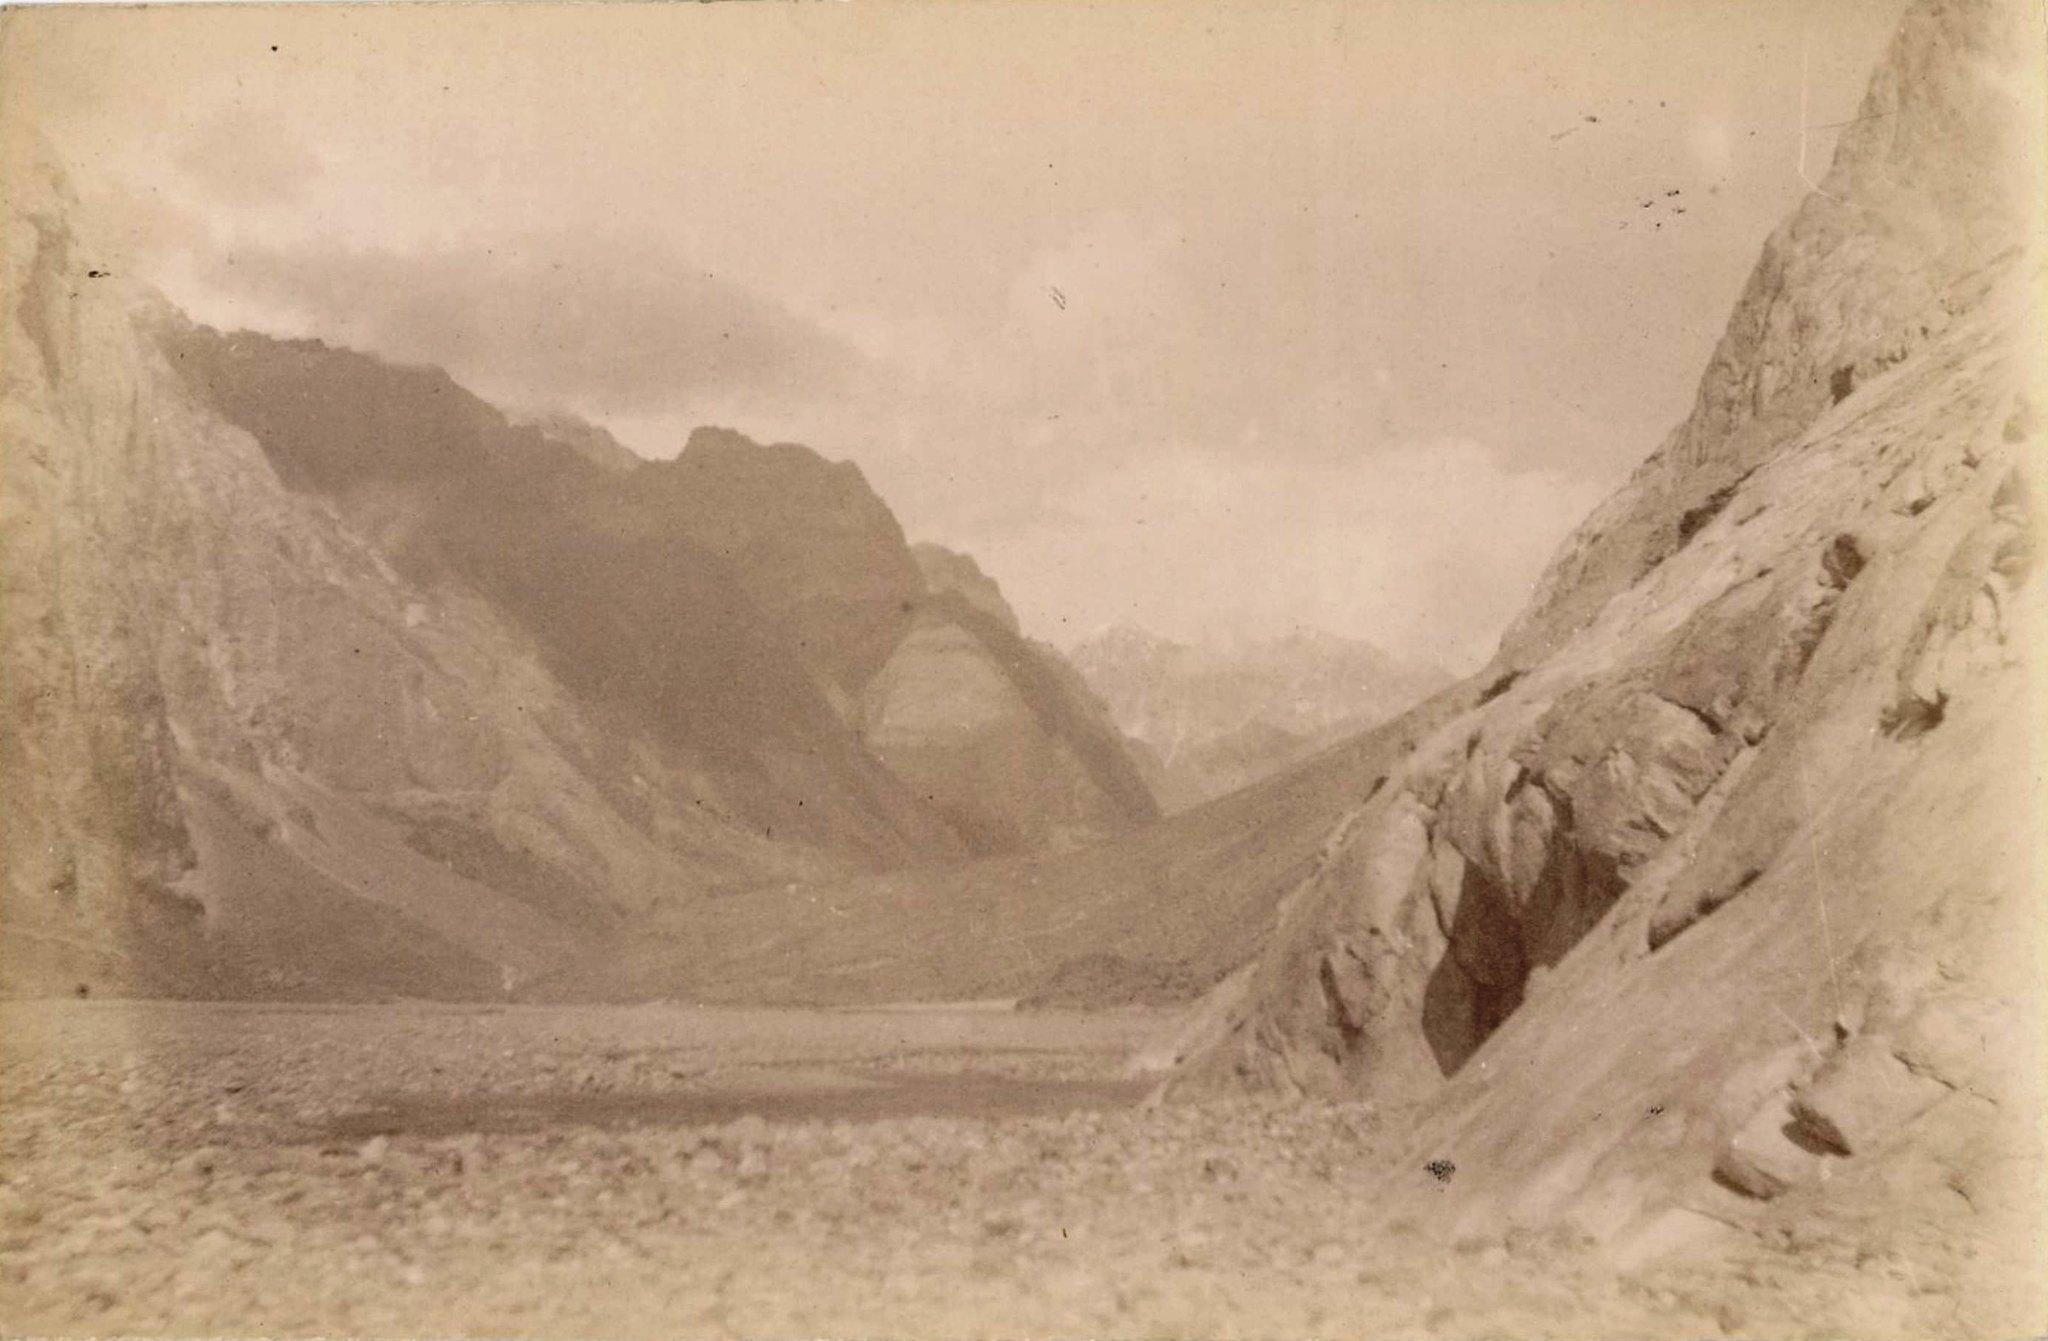 13. Ледники гор Хан-Тенгри. Ледник Западный Моцарт